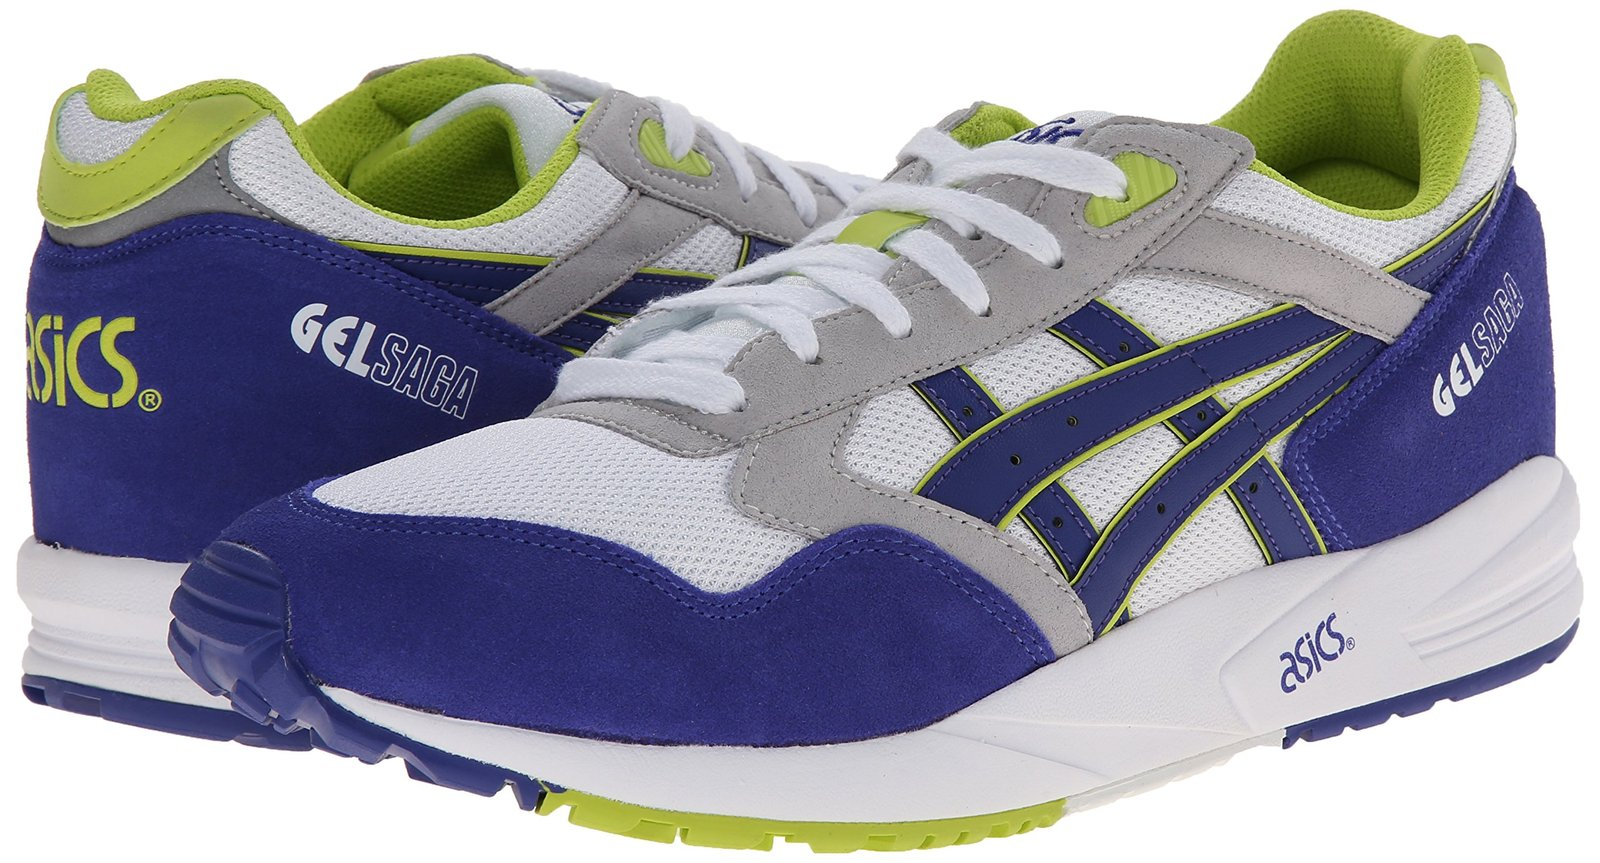 ASICS Gel-saga Retro Running Shoe, White/Dark Blue, 5.5 M US